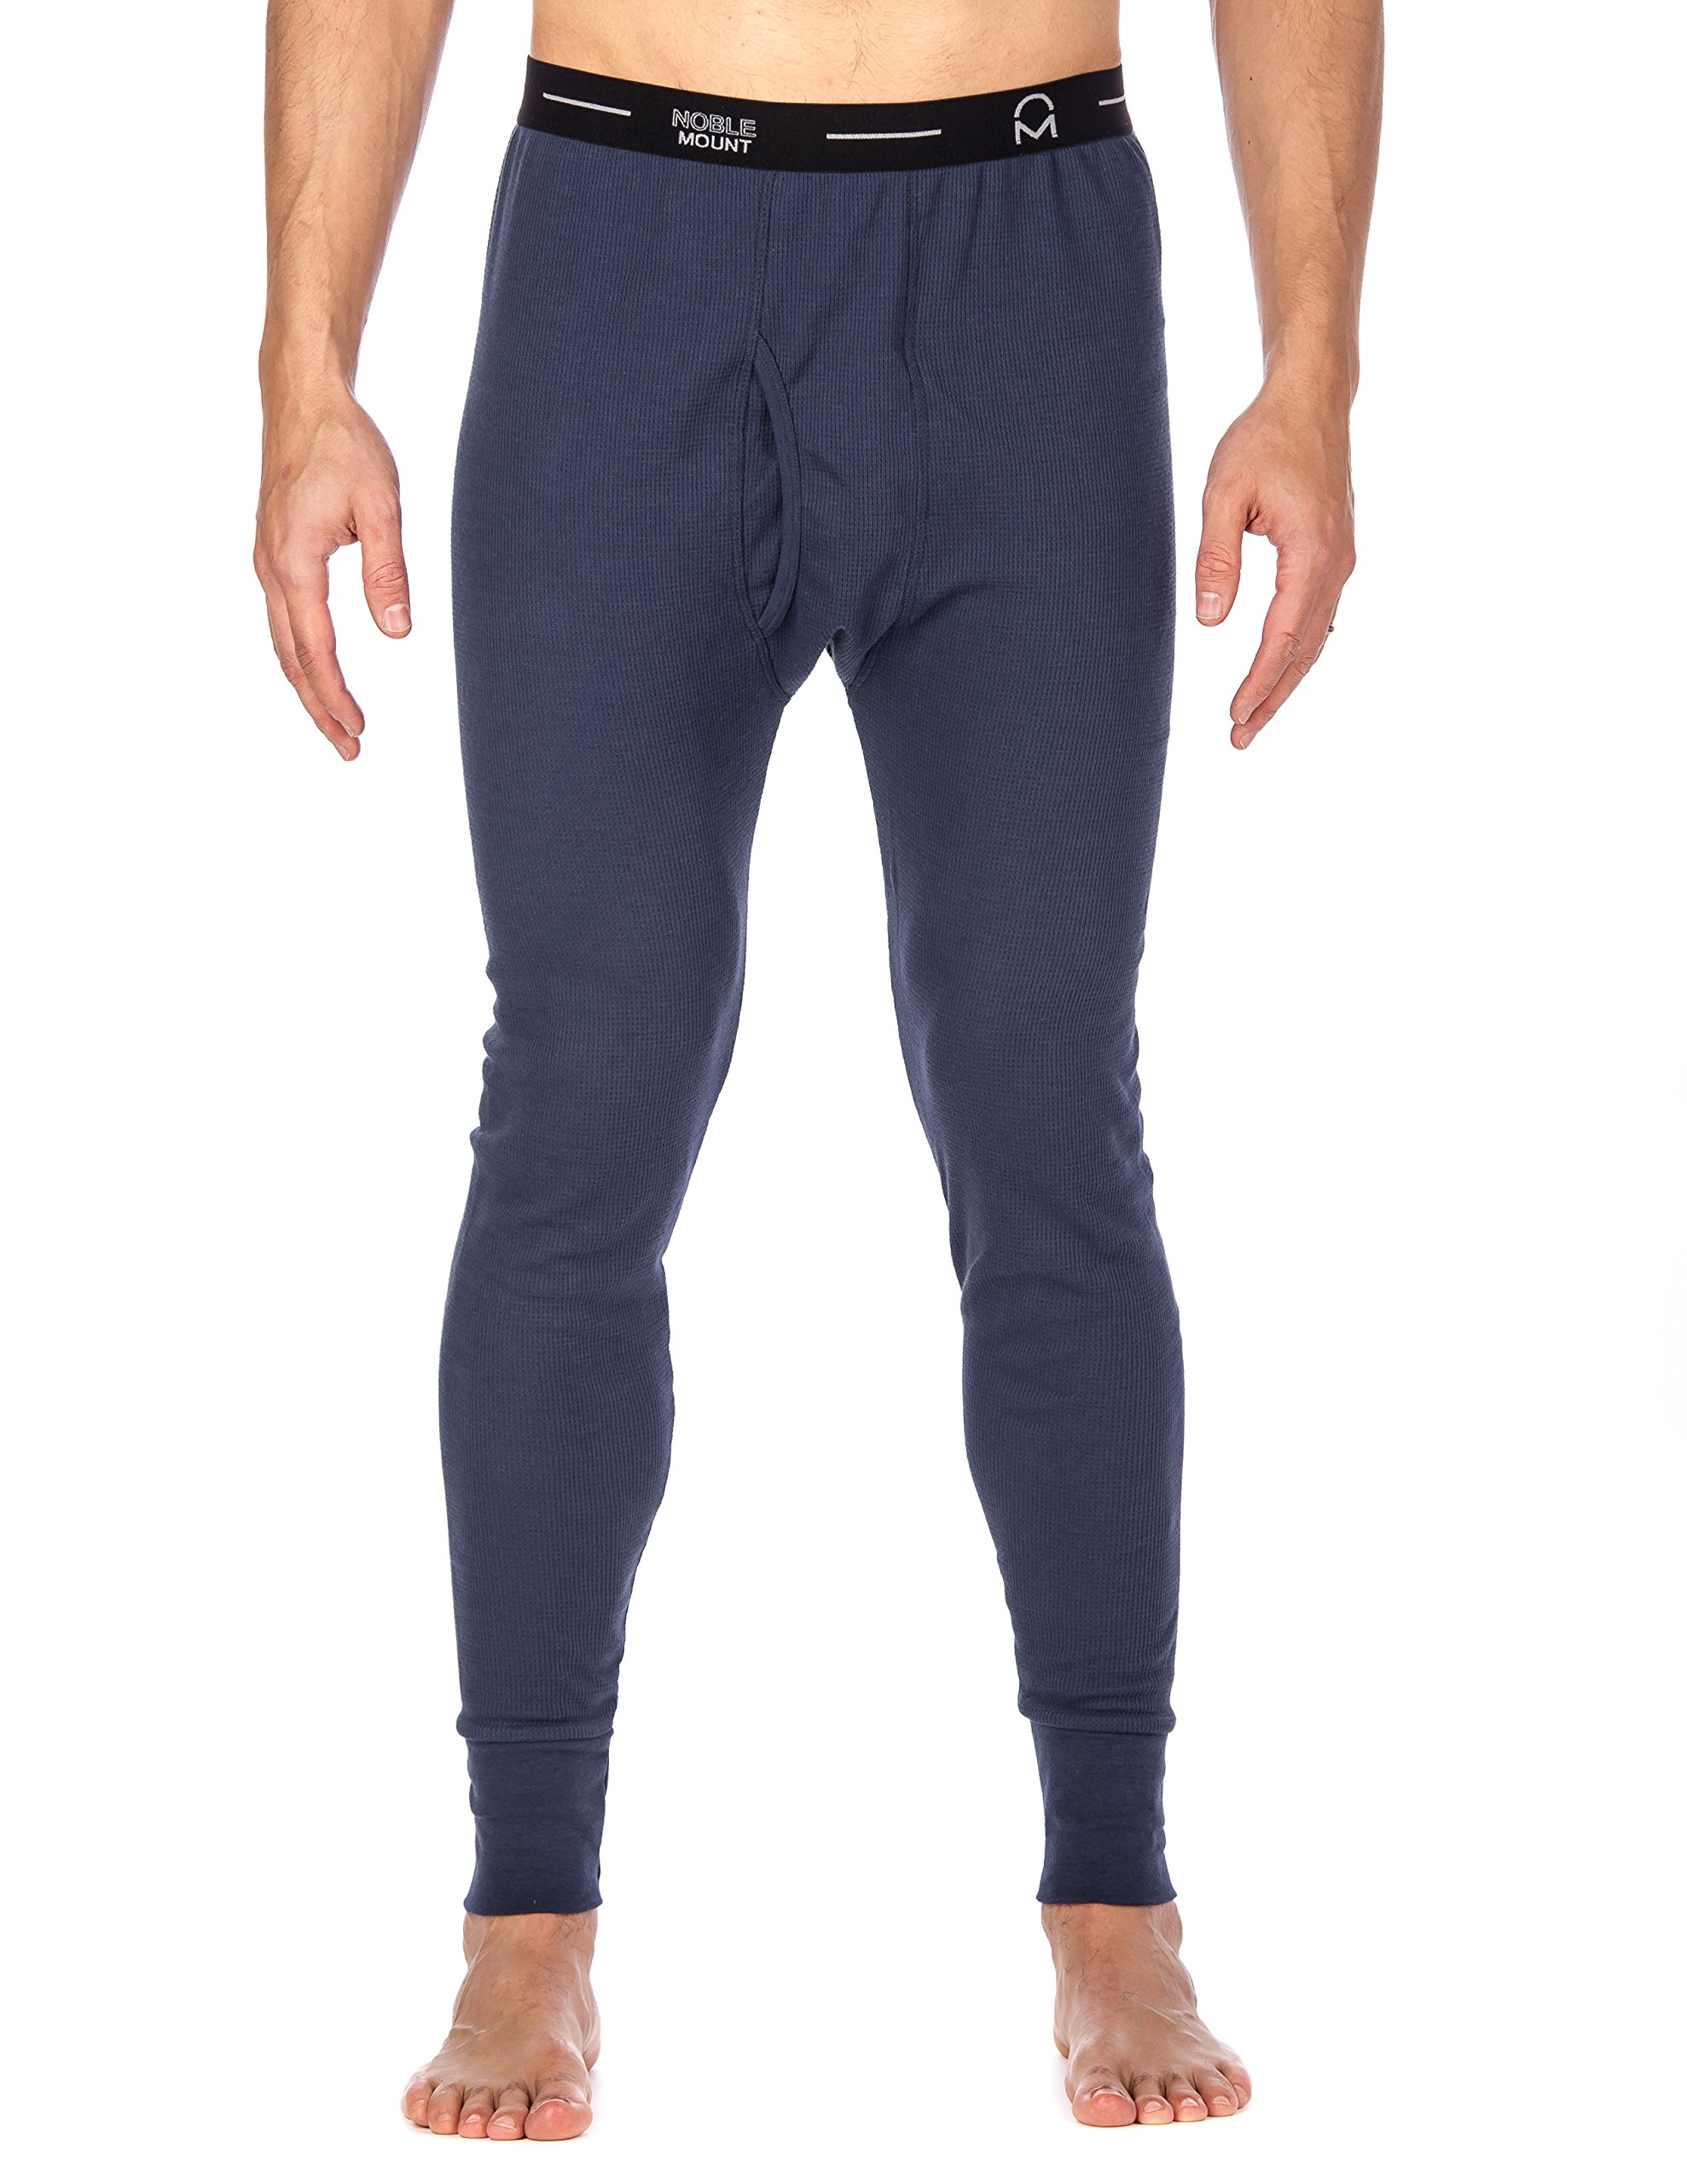 Men's Extreme Cold Waffle Knit Thermal Long John Pants - Dark Blue -Large